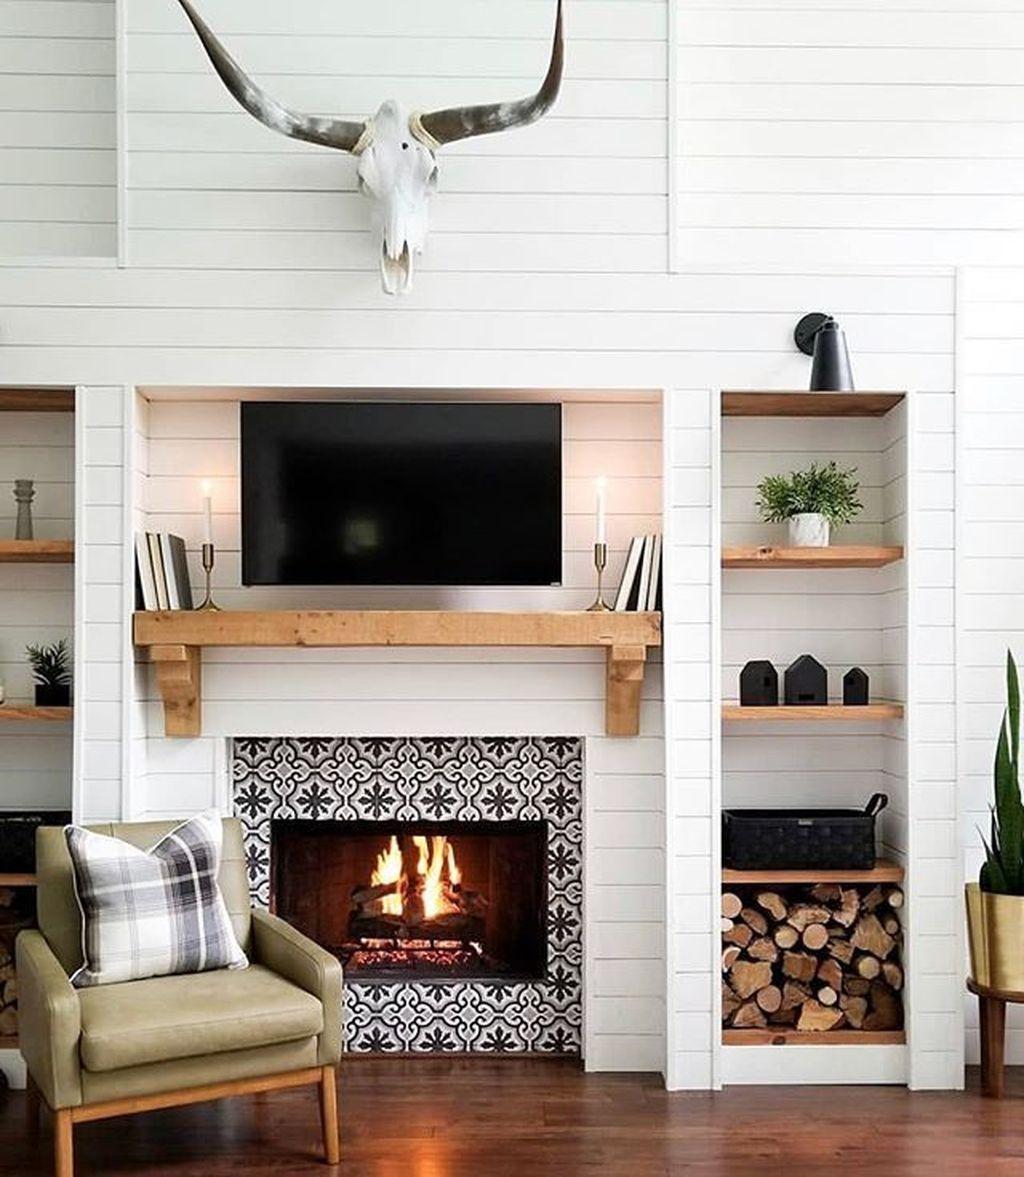 46 Gorgeous Modern Farmhouse Fireplace Ideas You Should Copy Now - HOOMDESIGN